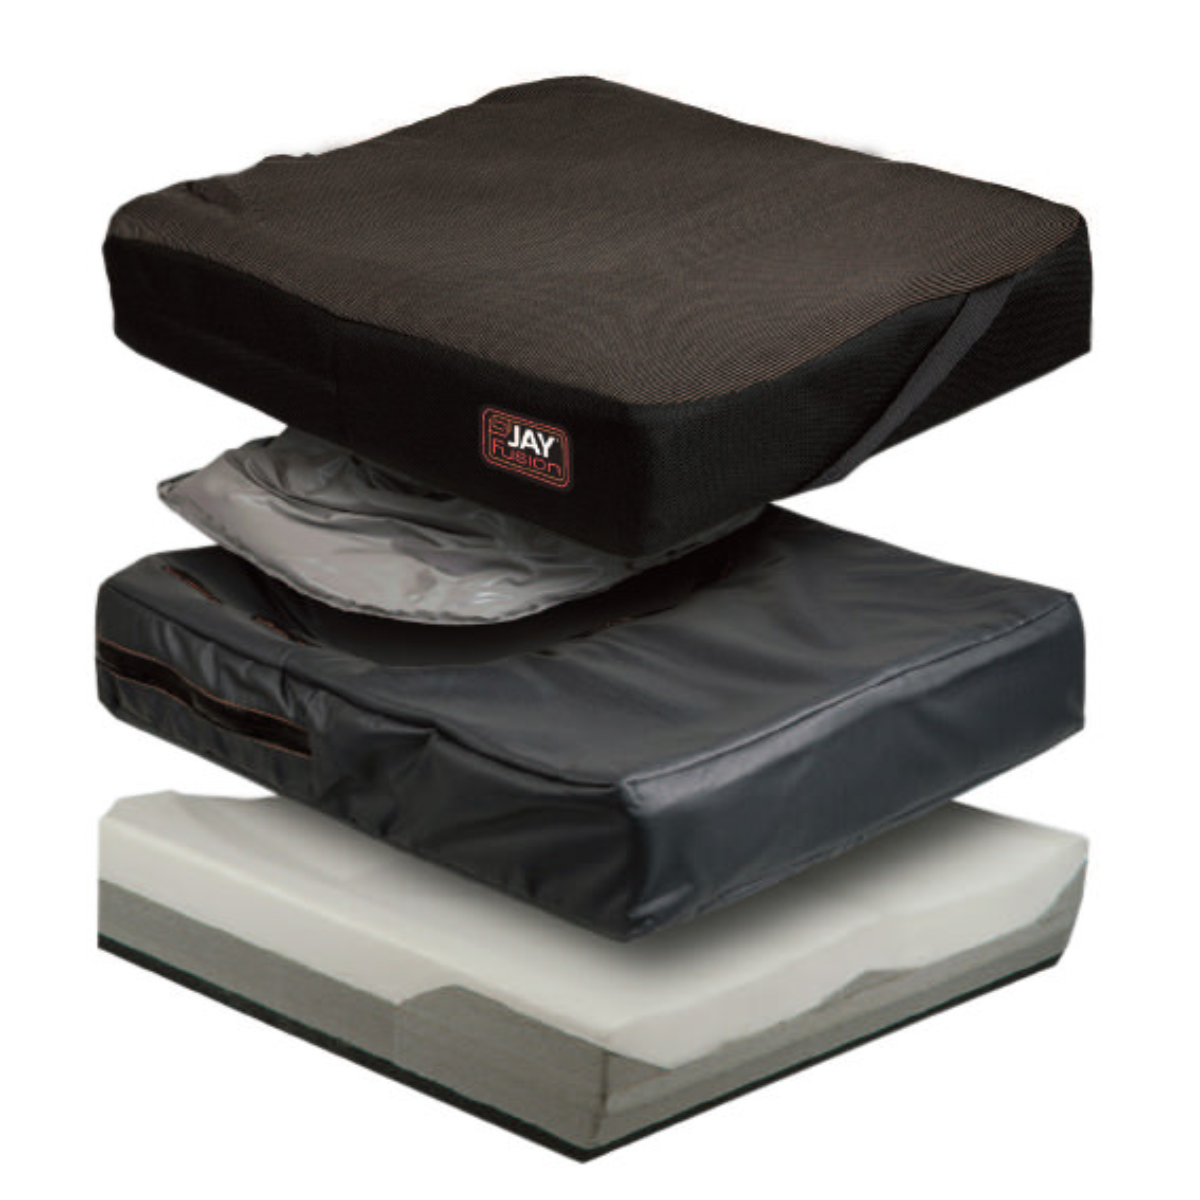 Jay Fusion Core adjustable cushion, base, pad, cover